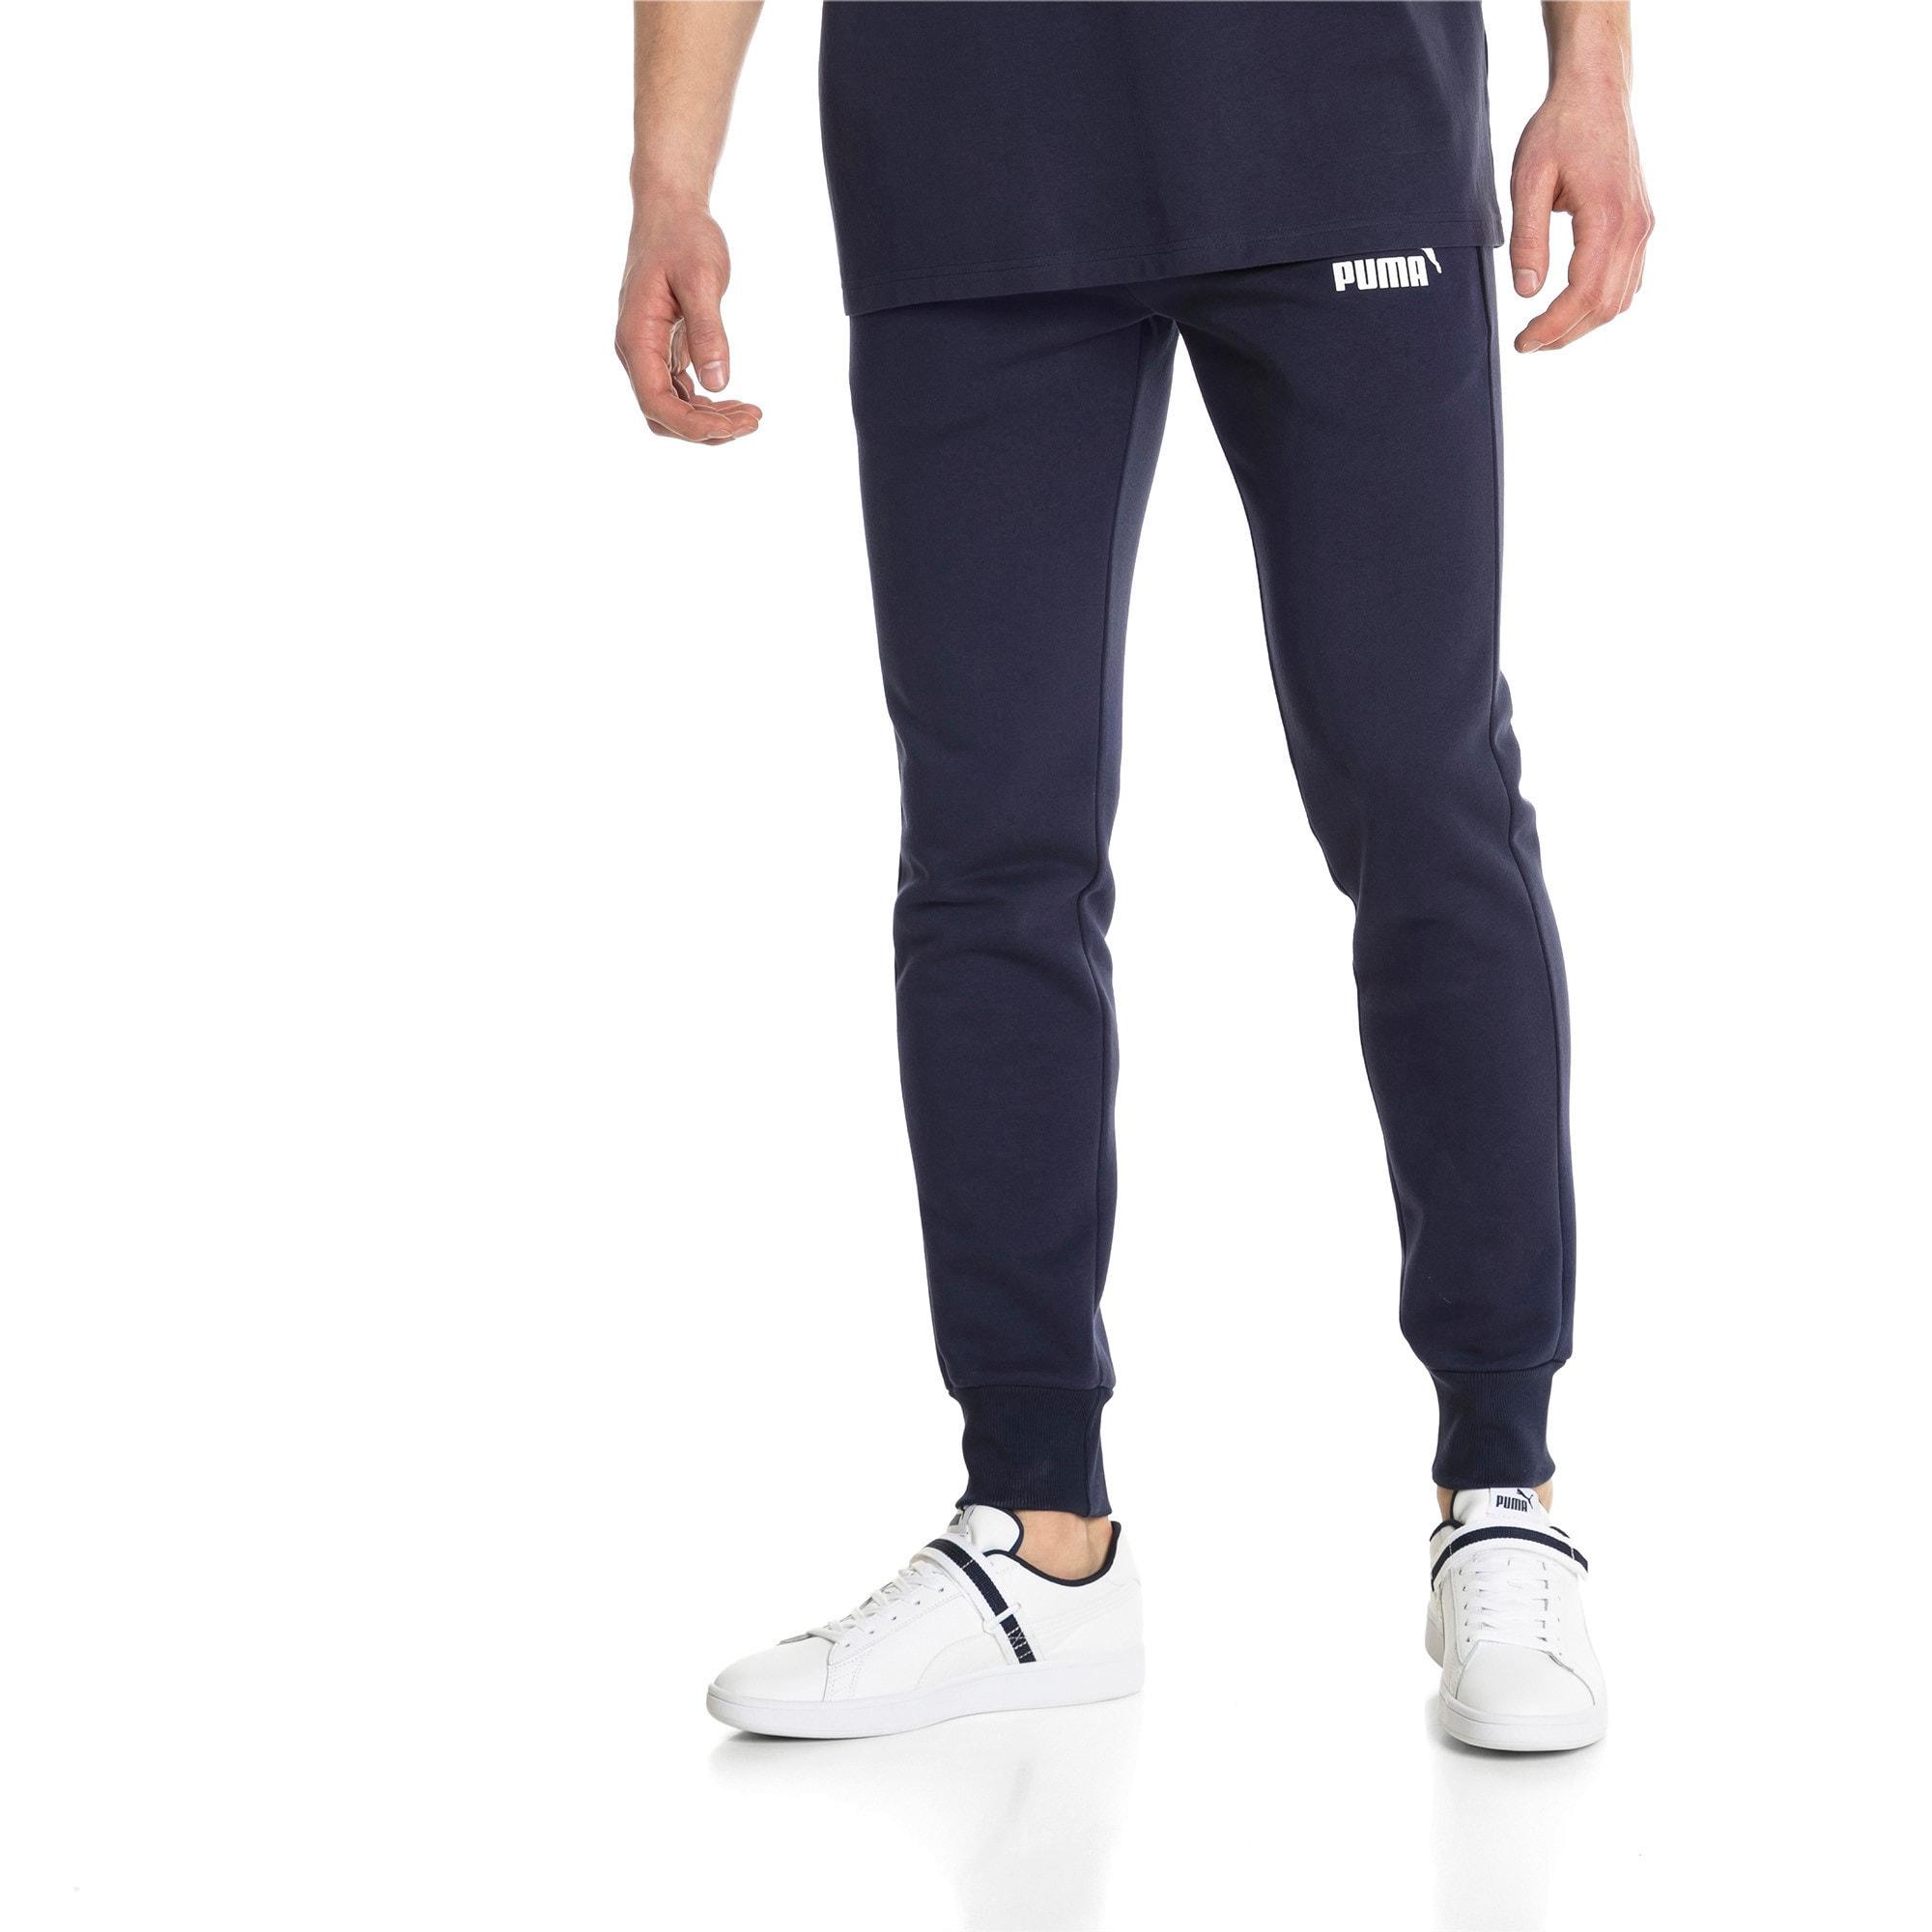 Essentials Men's Fleece Knit Pants, Peacoat, large